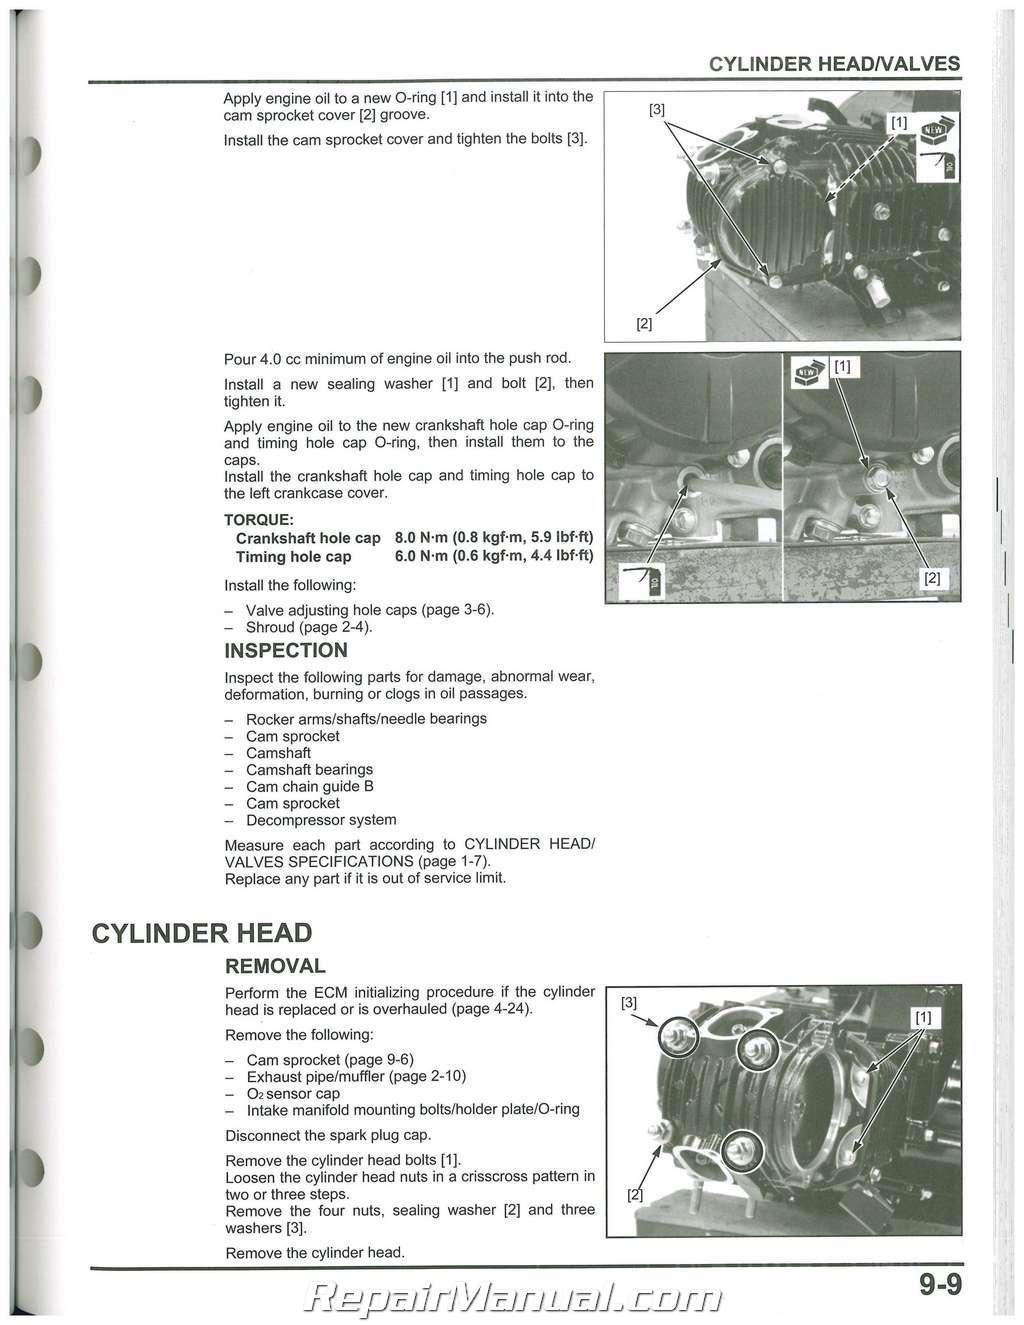 2014 Honda Grom Service Manual